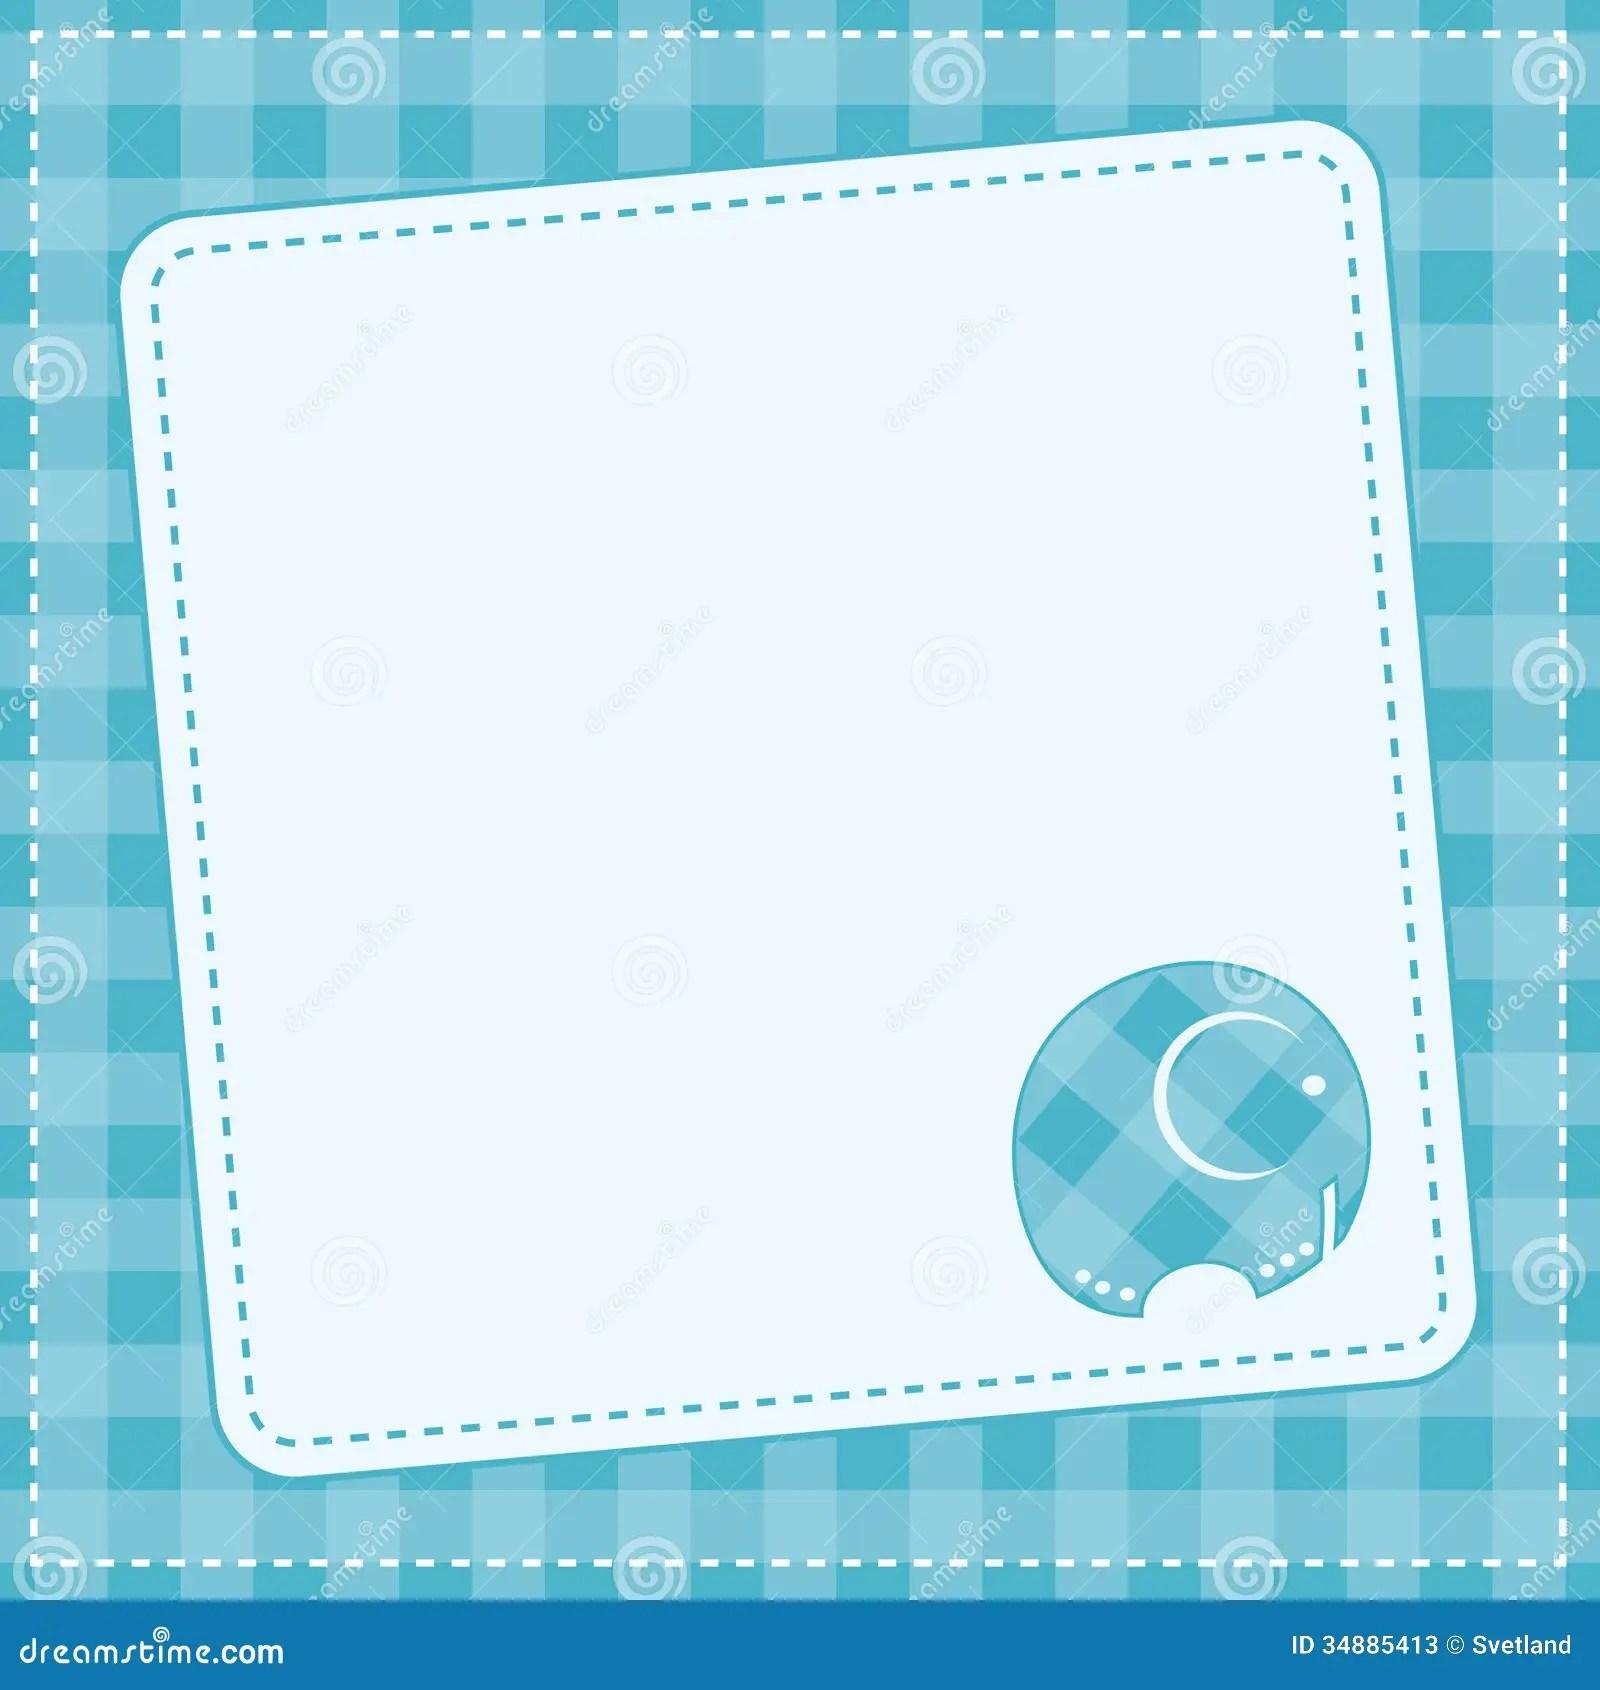 Animal Print Wallpaper Border Baby Boy Announcement Card Vector Illustration Stock